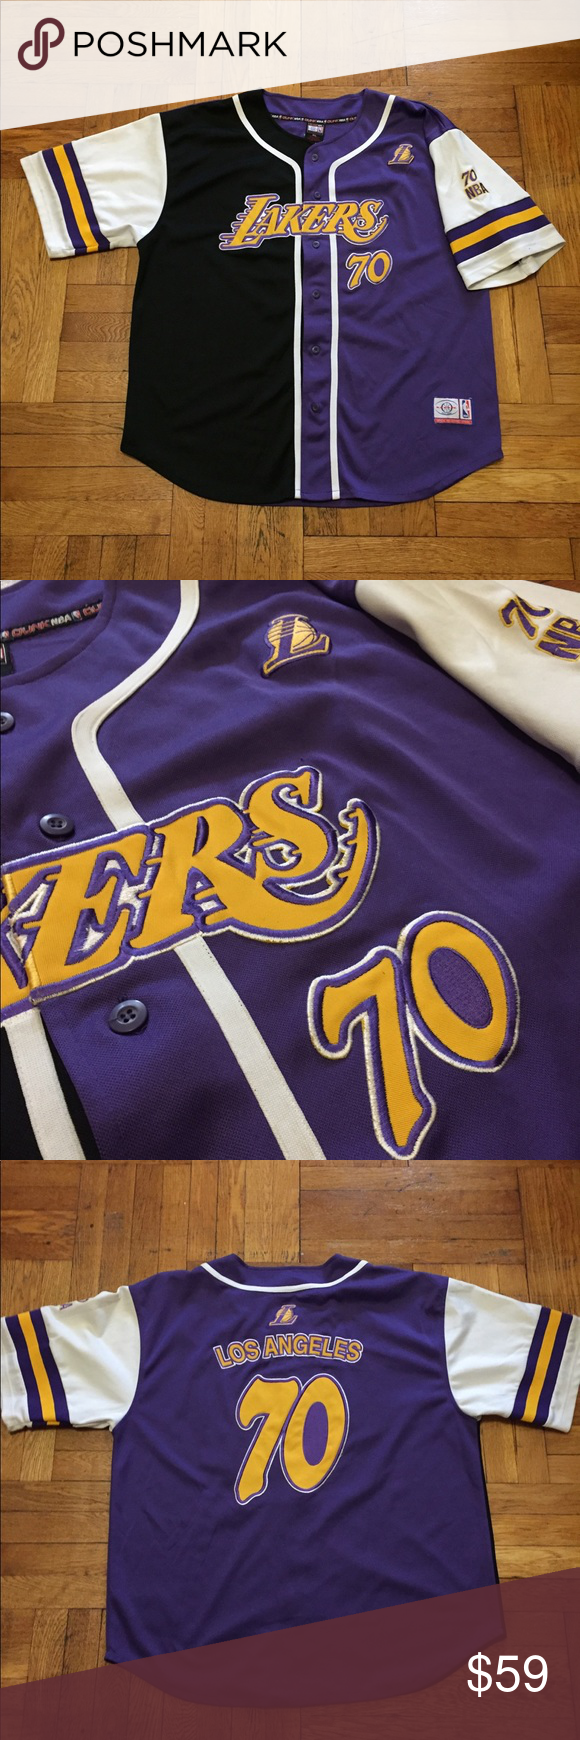 Vintage Lakers Baseball Jersey 3x 3xl Shirts Baseball Jerseys Clothes Design